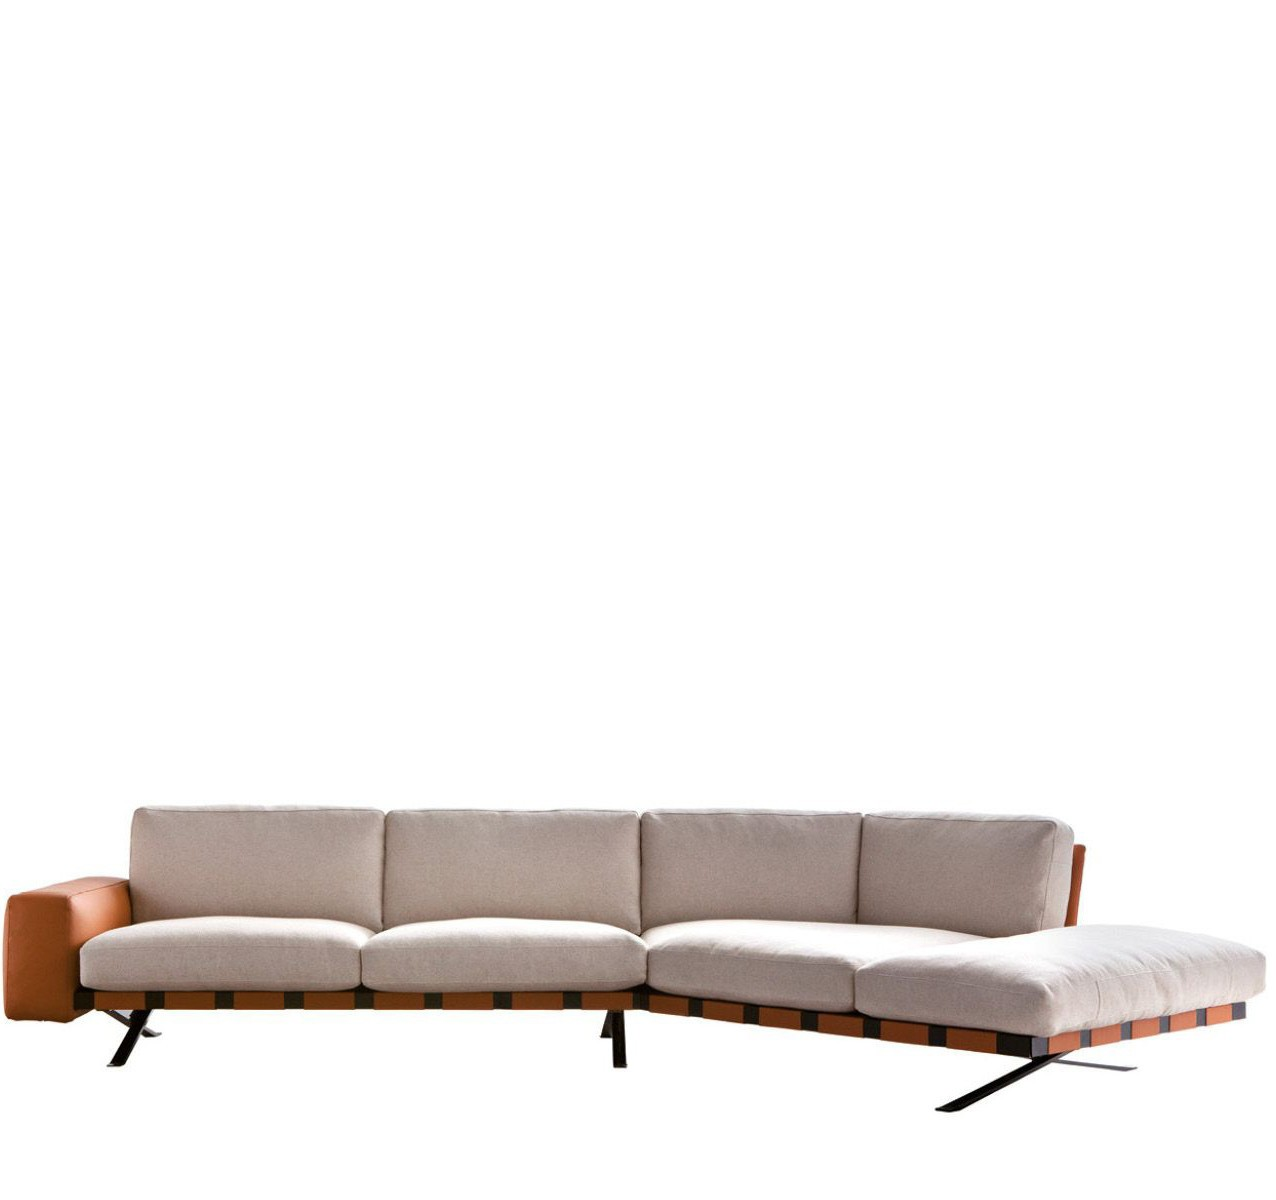 Fenix 2 - Composite Set Colorado - Bianco 111, Cairo - Bianco 01, Left Linear Set